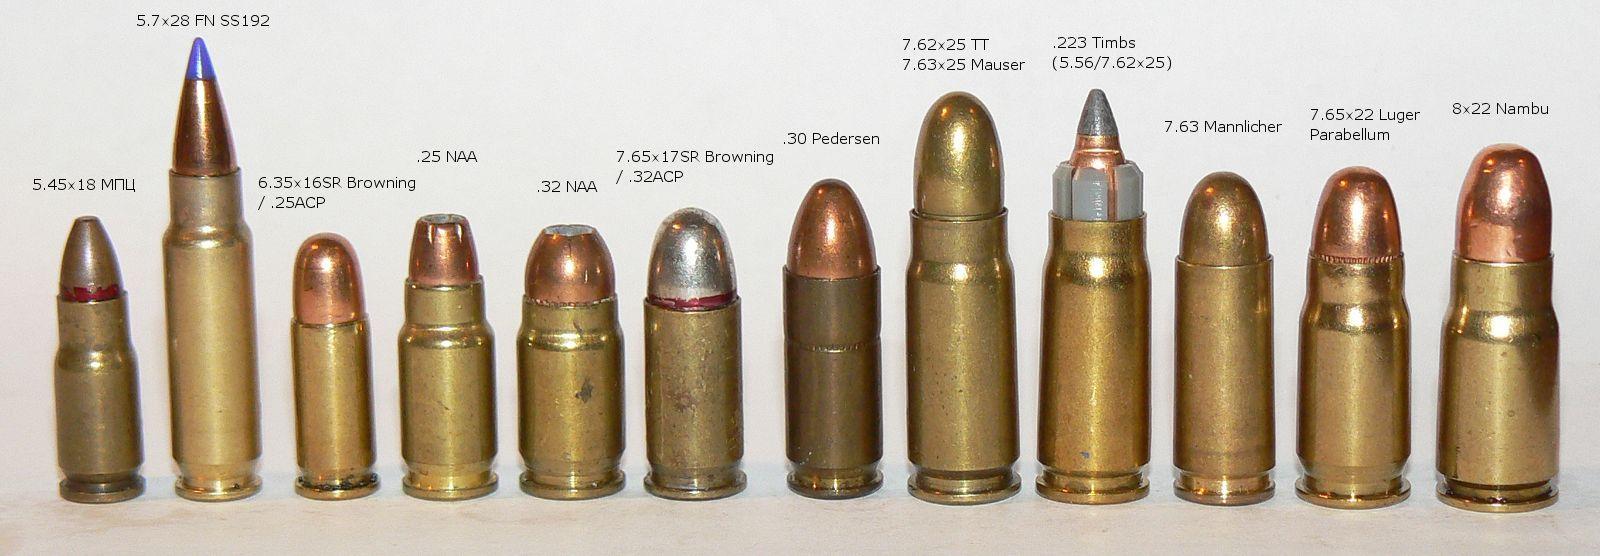 44 Magnum Bullets vs 45